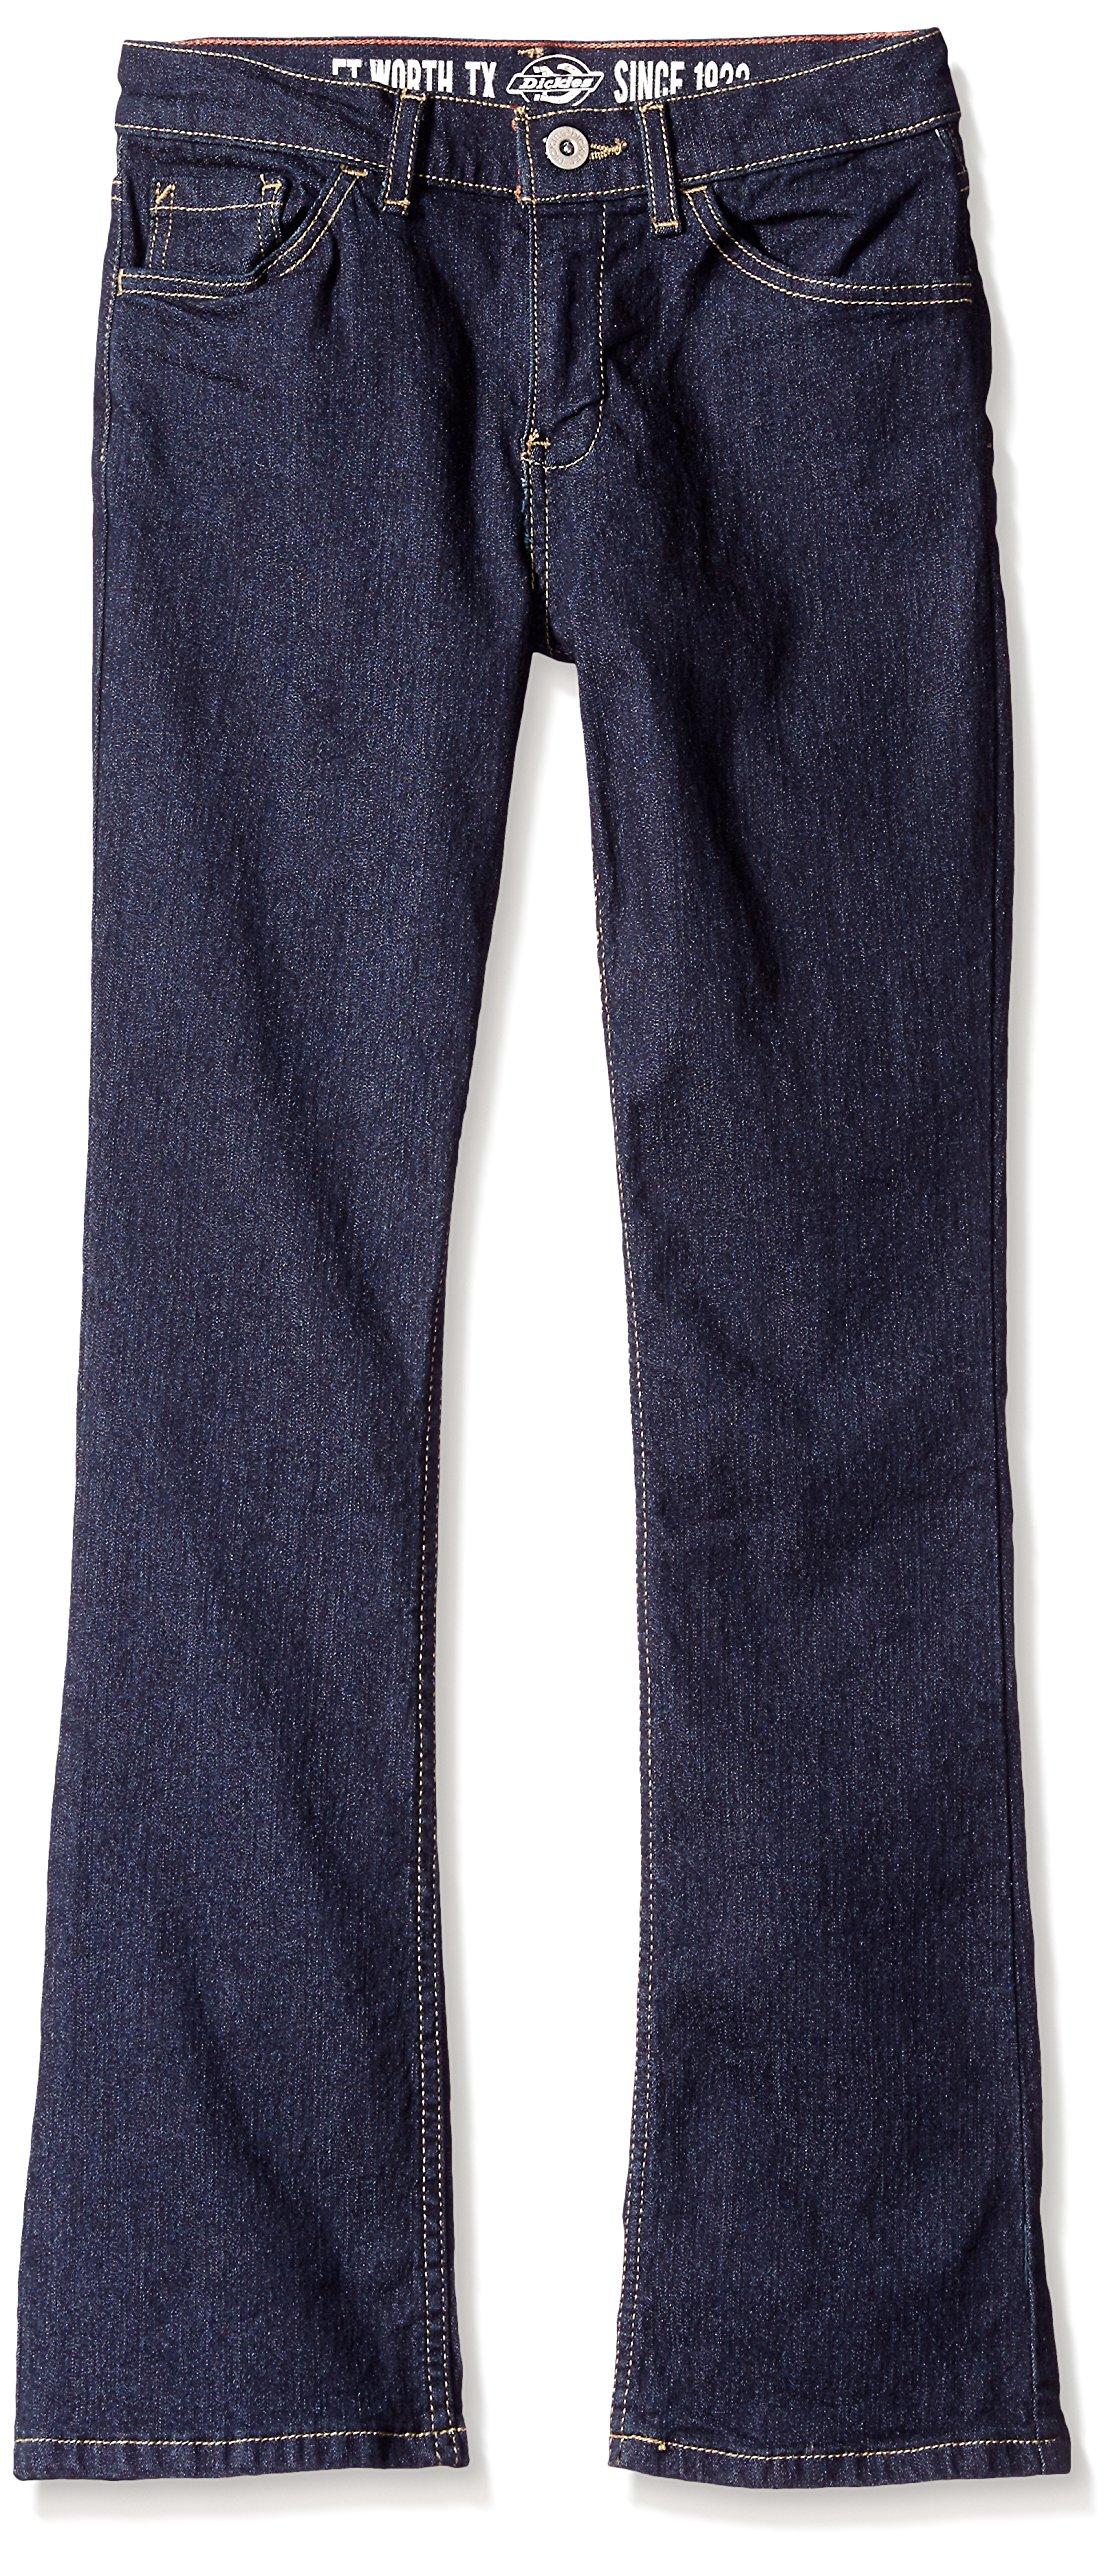 Dickies Big Girls' Stretch Boot Cut Denim Jean, Rinsed Indigo Blue, 16